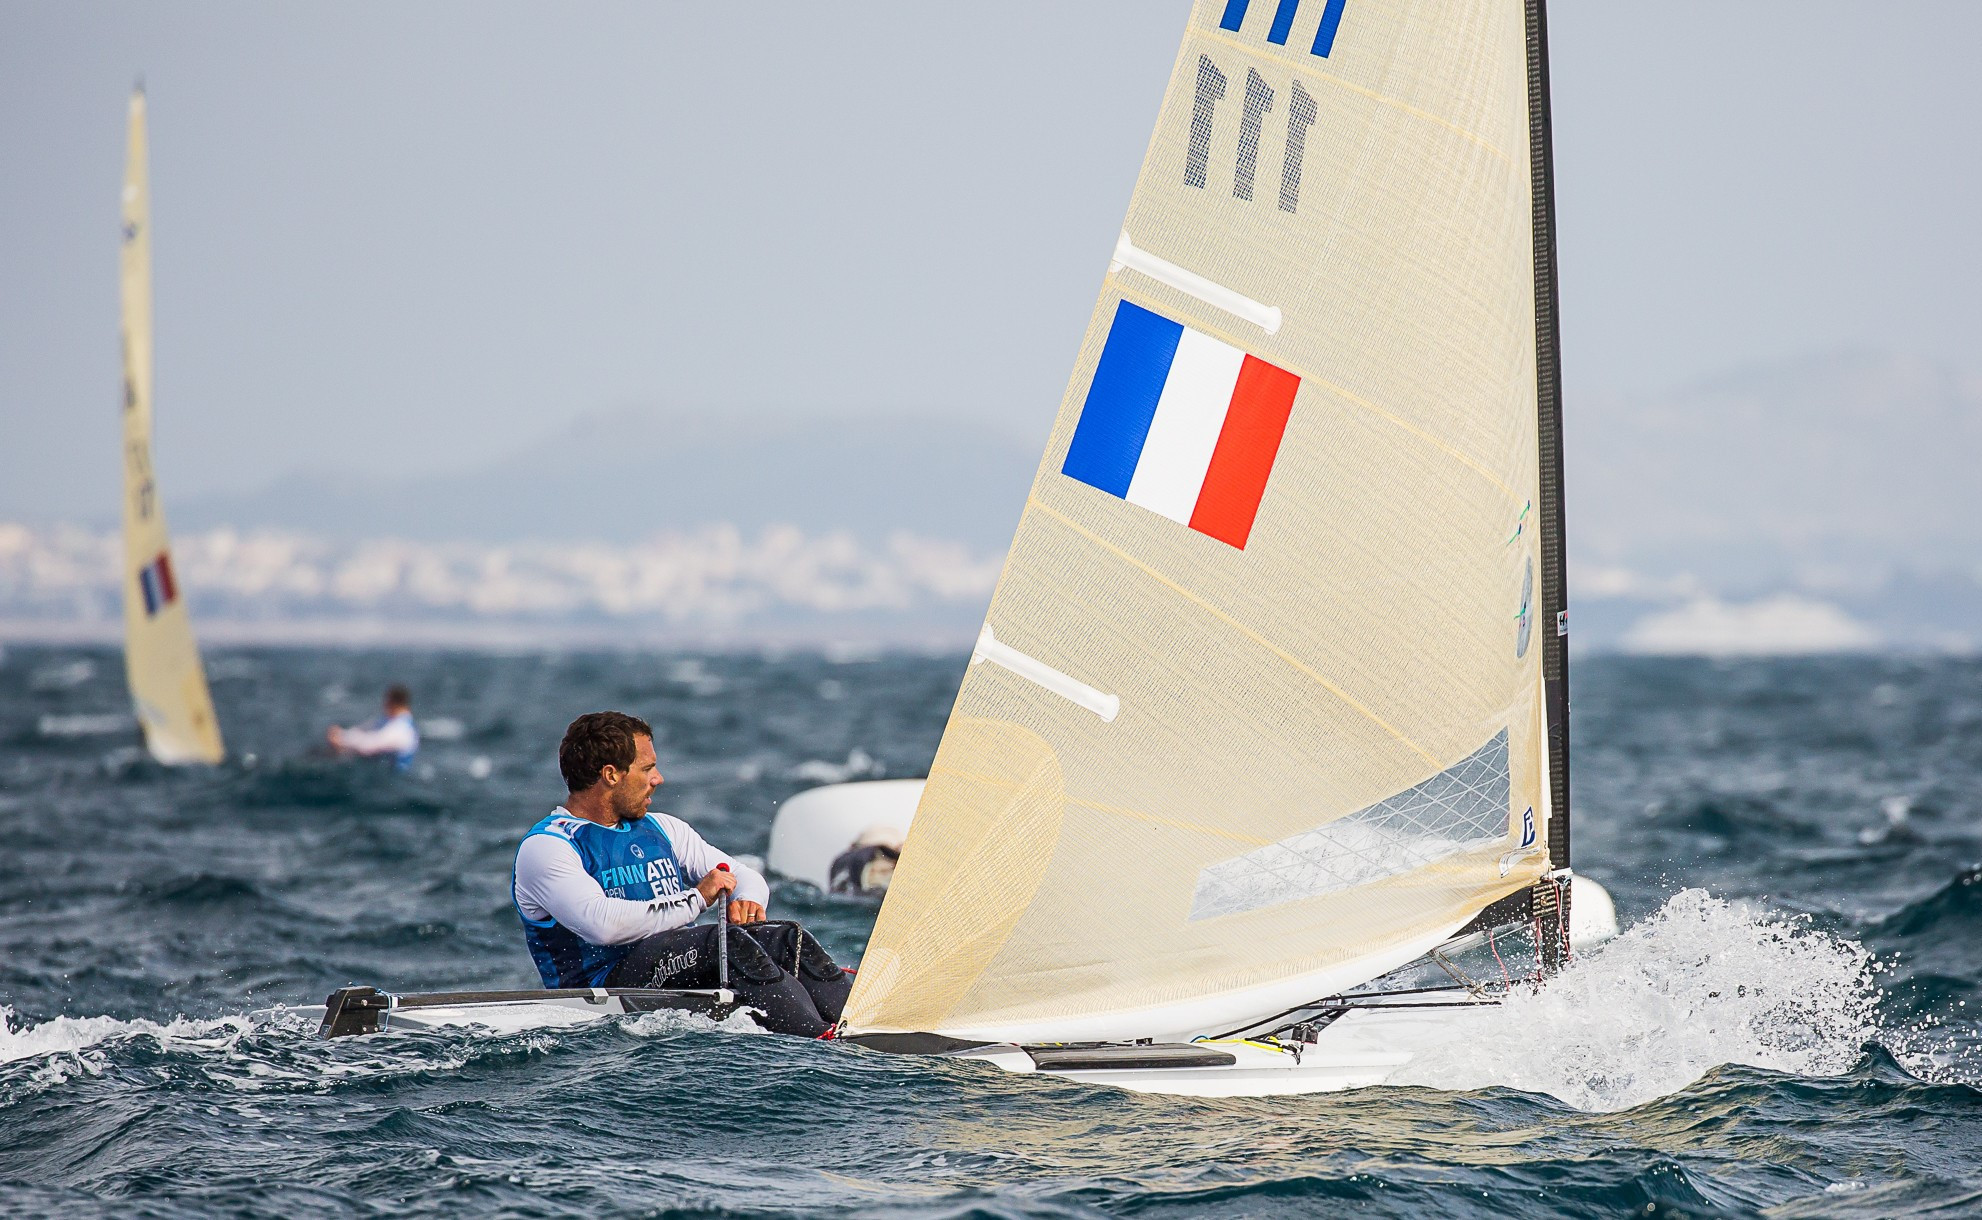 Lebrun extends lead at Finn World Masters